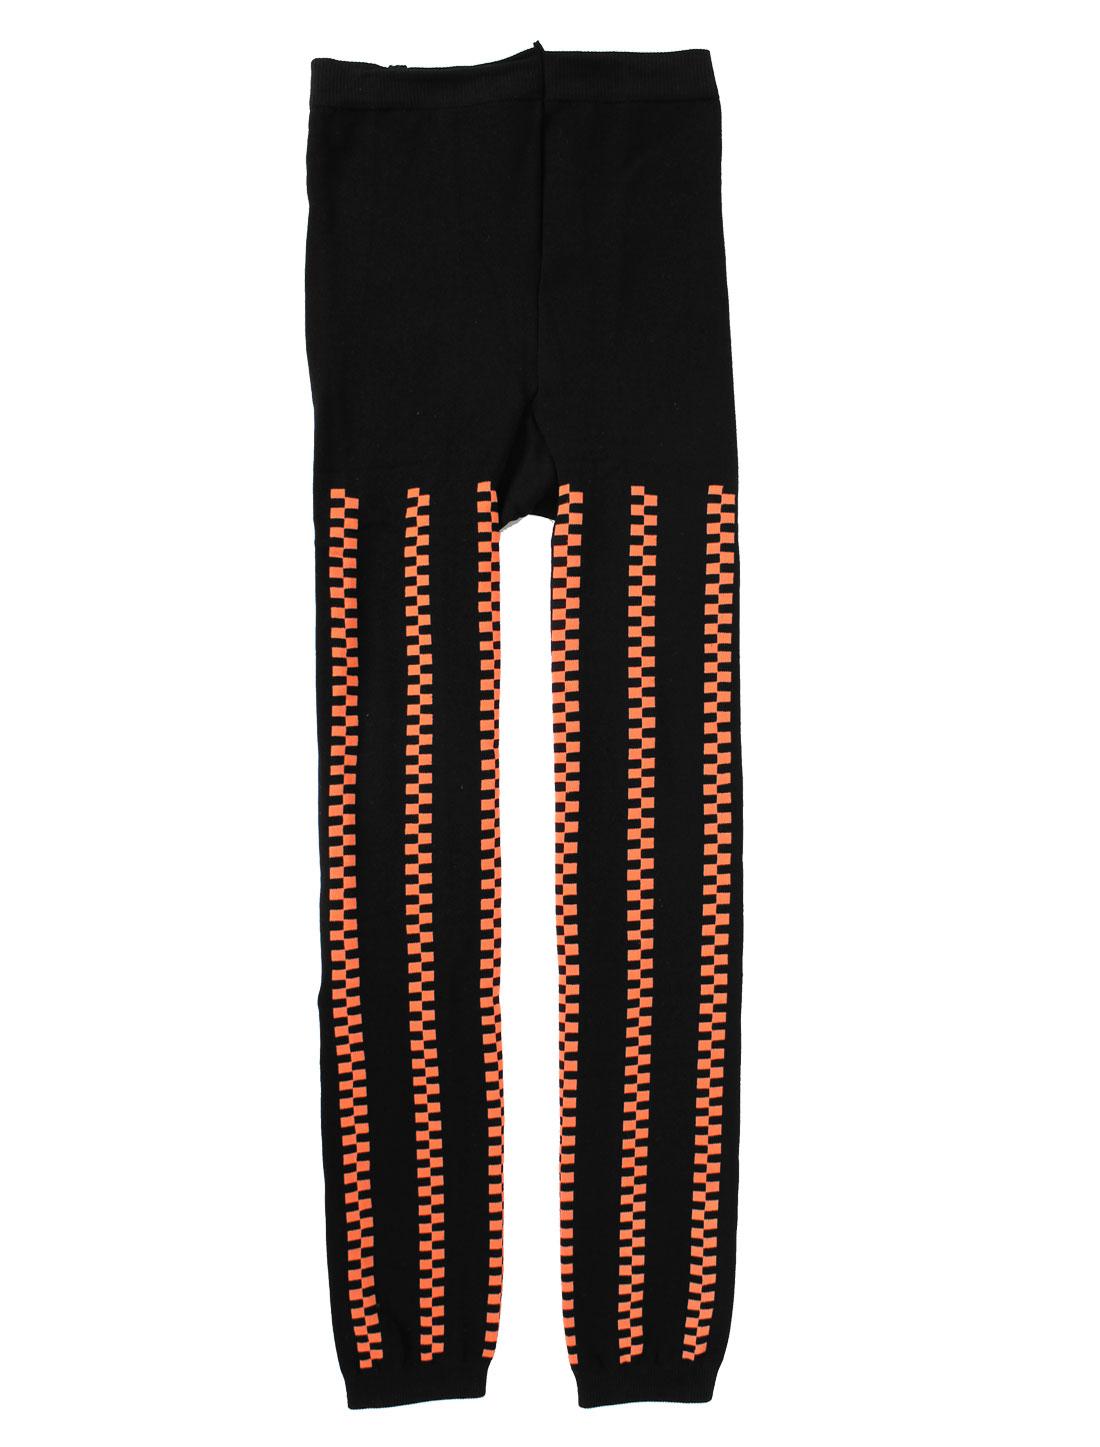 Lady Plaids Prints Elastic Waist Skinny Casual Leggings Warmer Black M